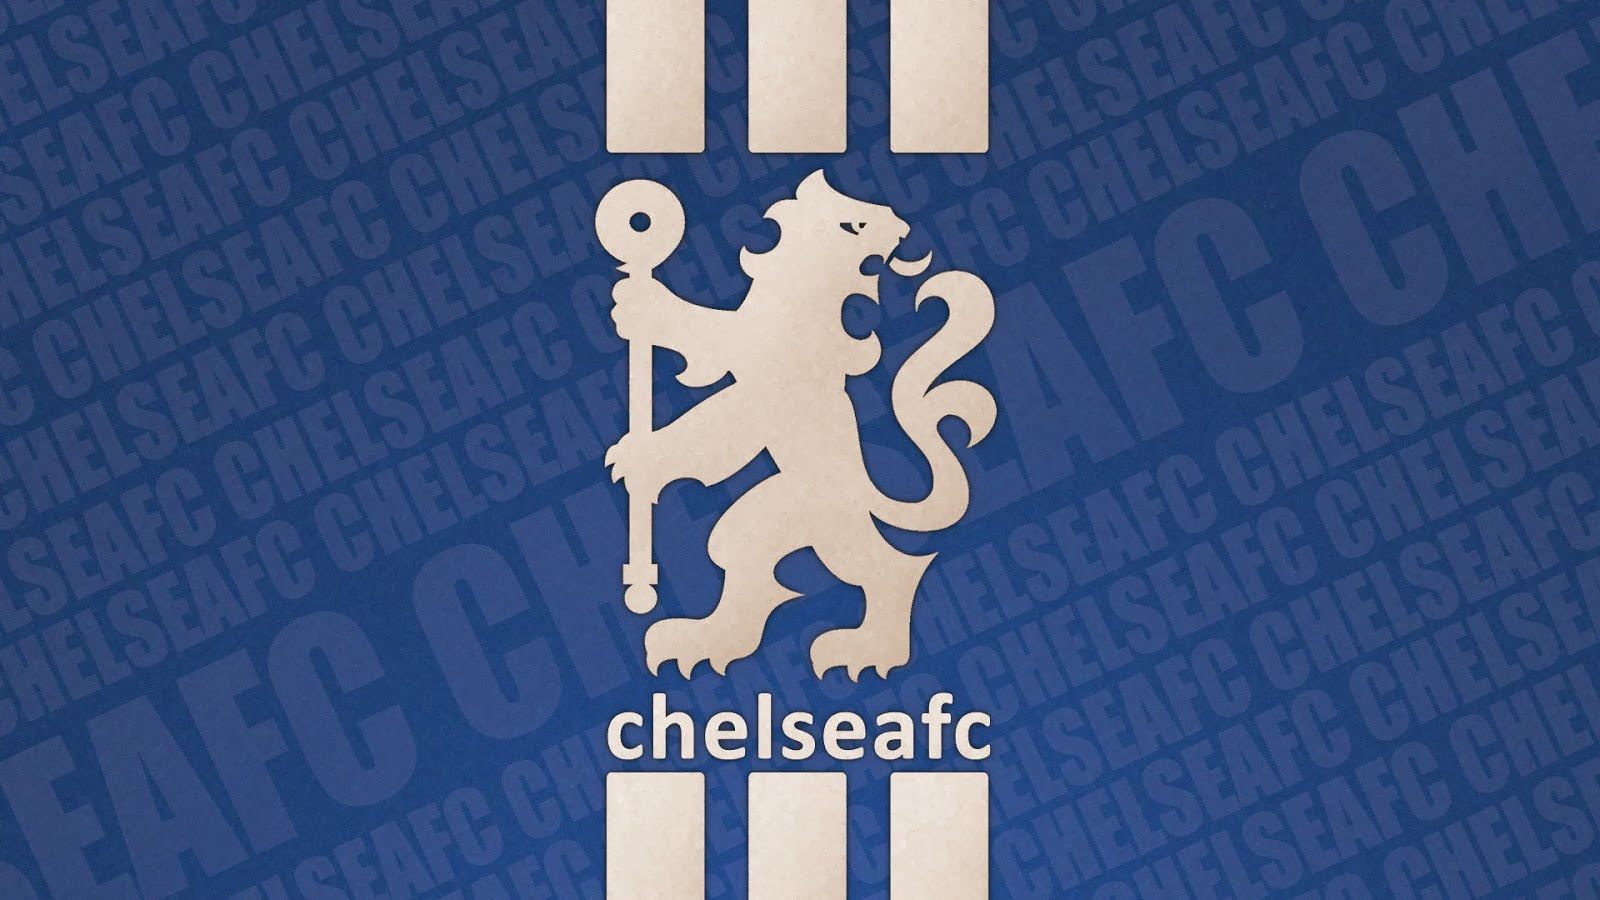 New Chelsea FC Wallpaper HD 2014 - 2015